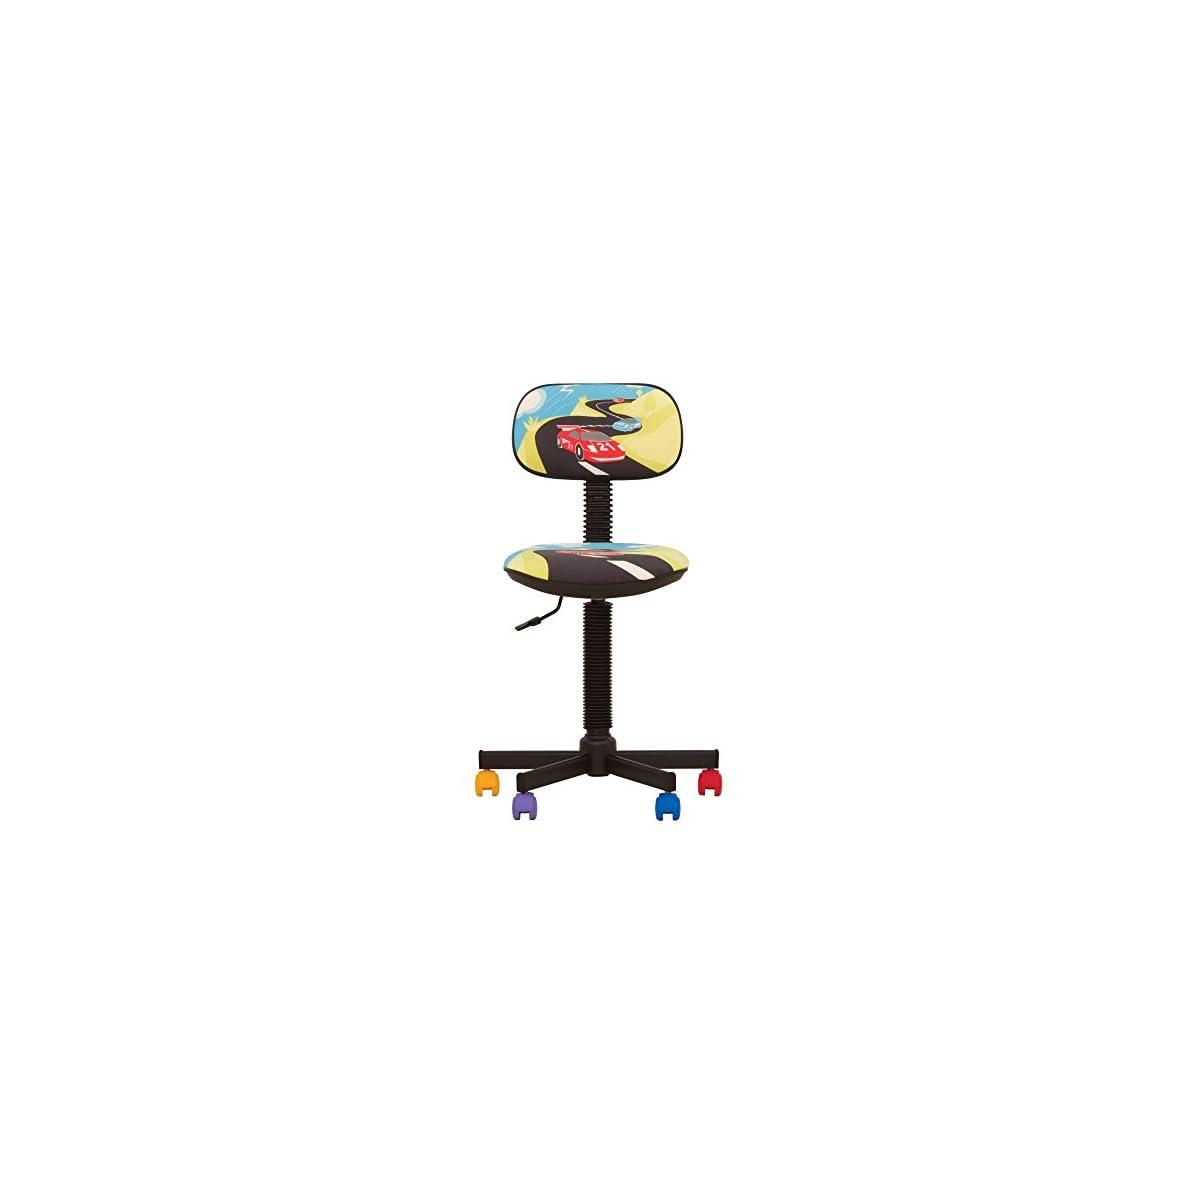 414GfV%2BMlcL. SS1200  - Bambo - Silla de escritorio infantil ergonómica, altura del asiento 42 cm-56 cm),altura del respaldo ajustable/giratorio 360 °/ruedas multicolor